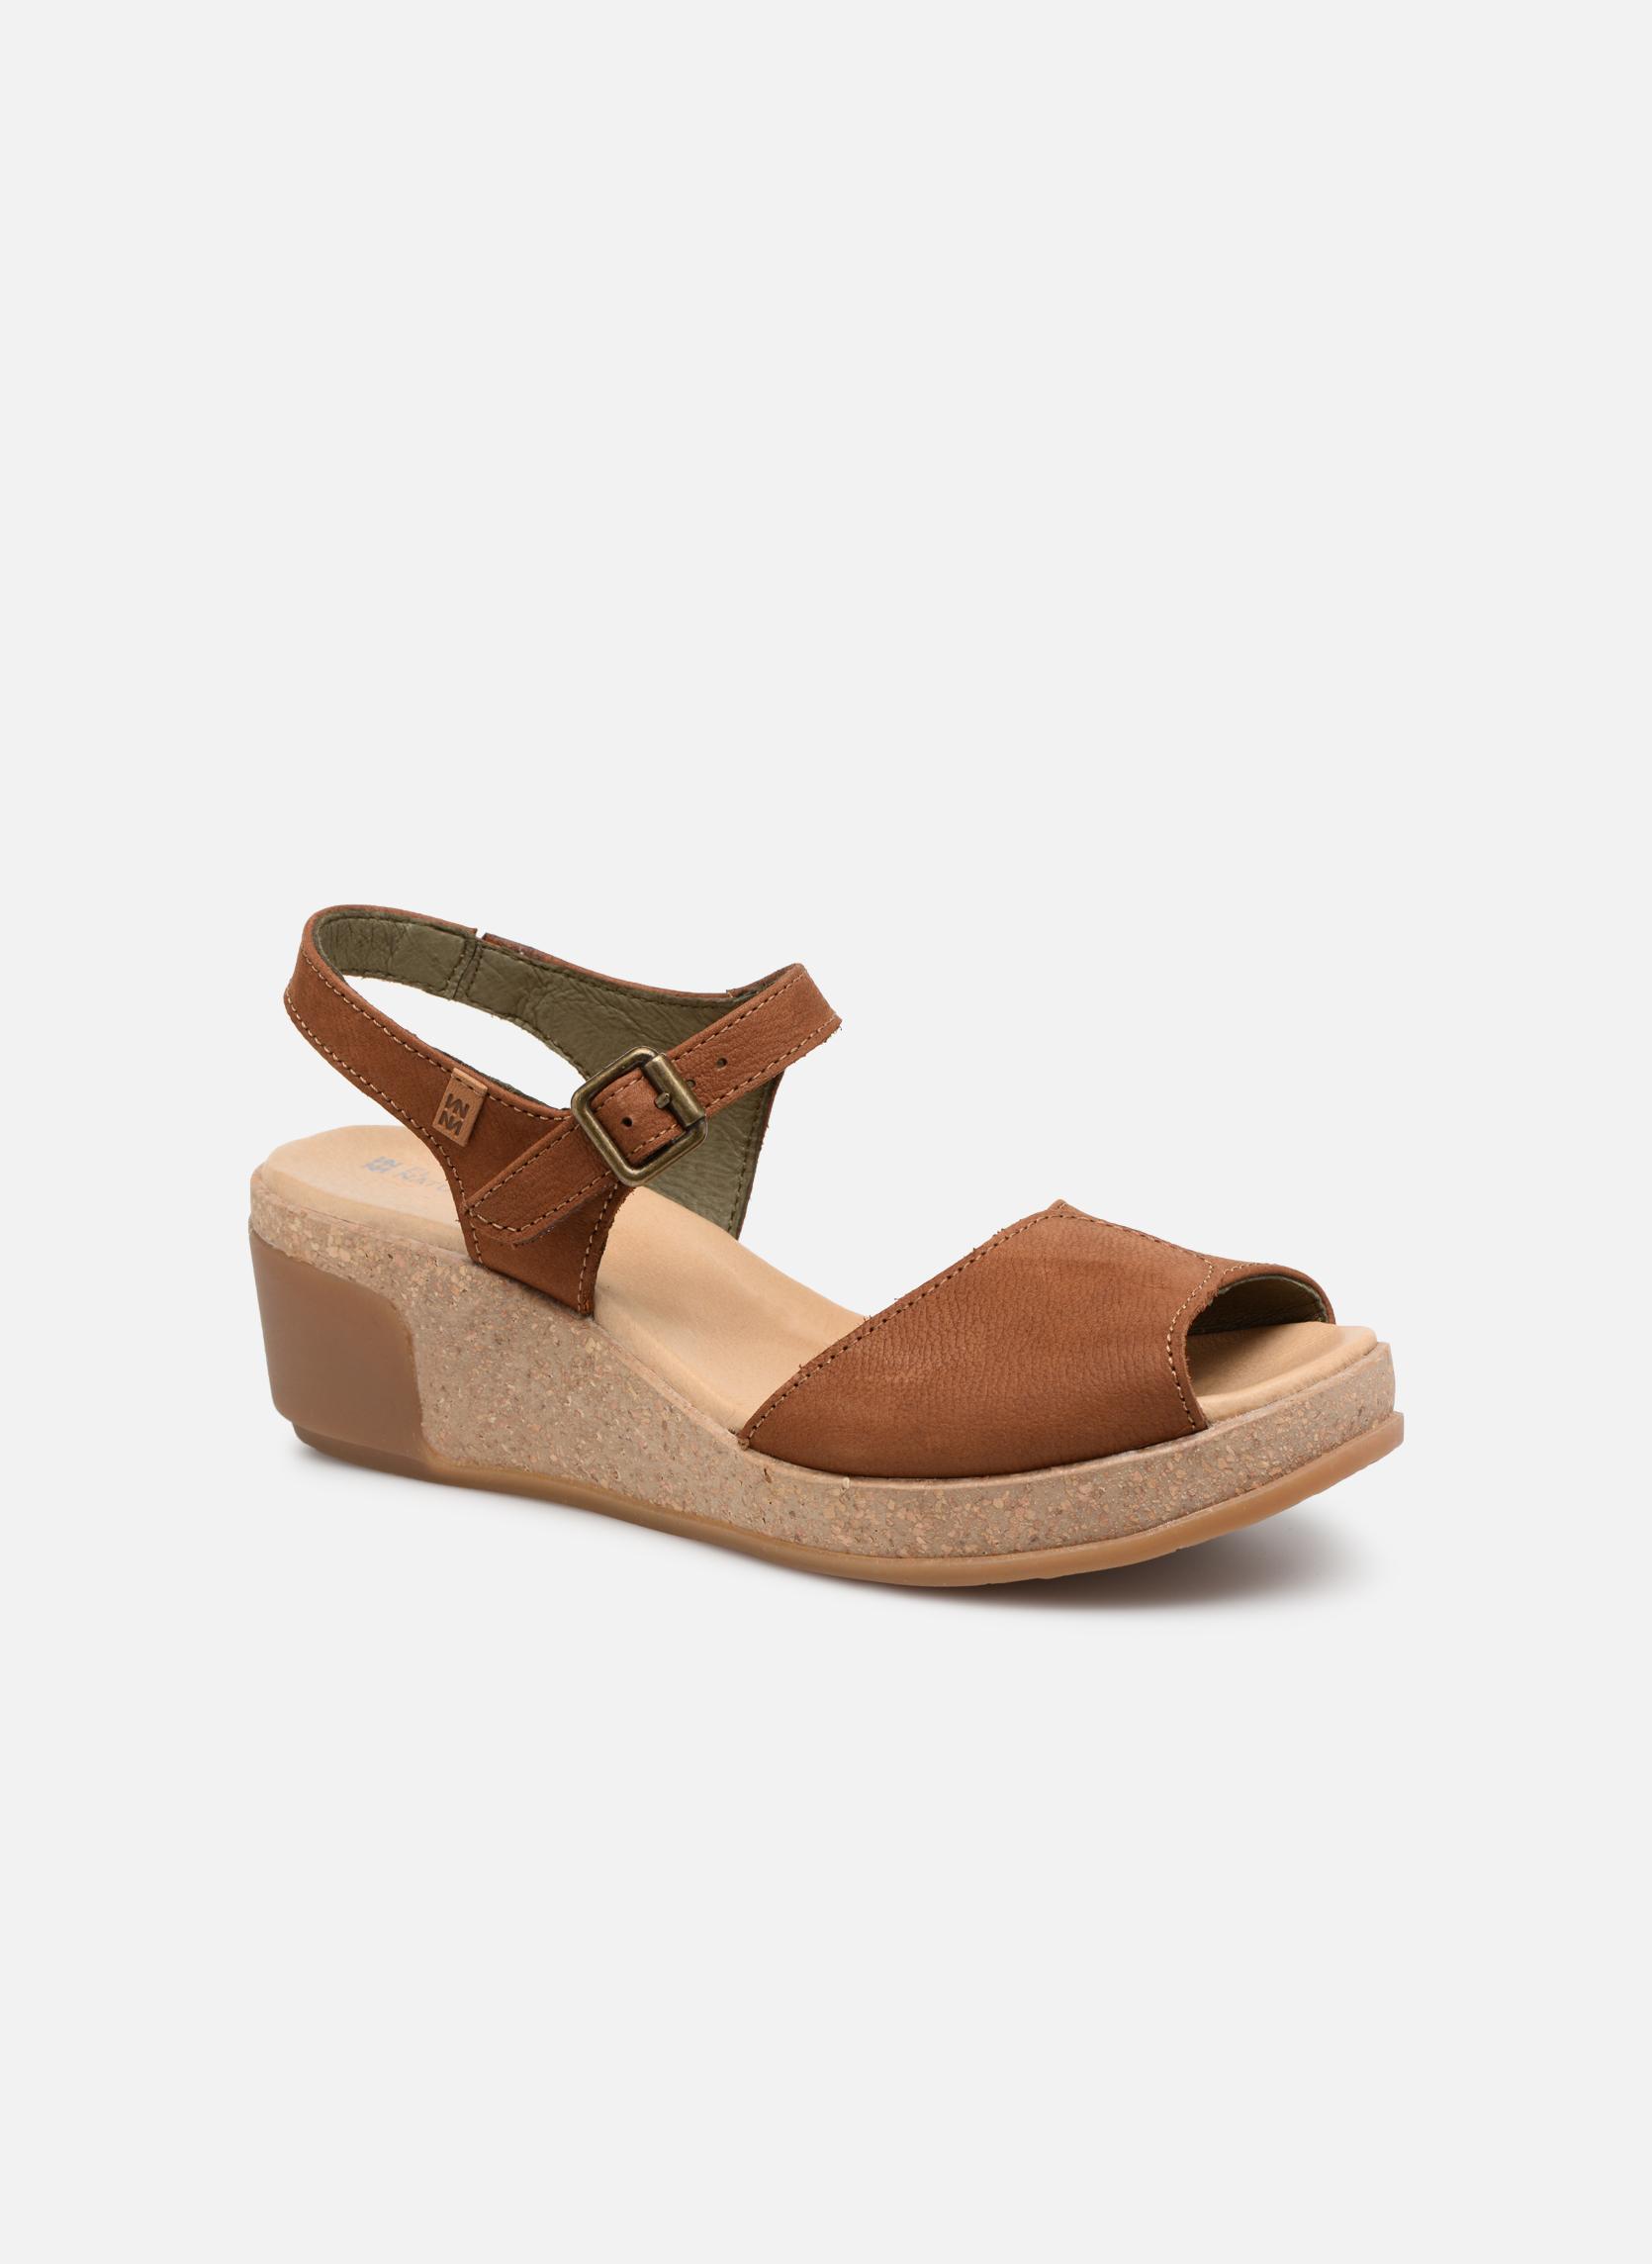 Sandalen Damen Leaves N5000